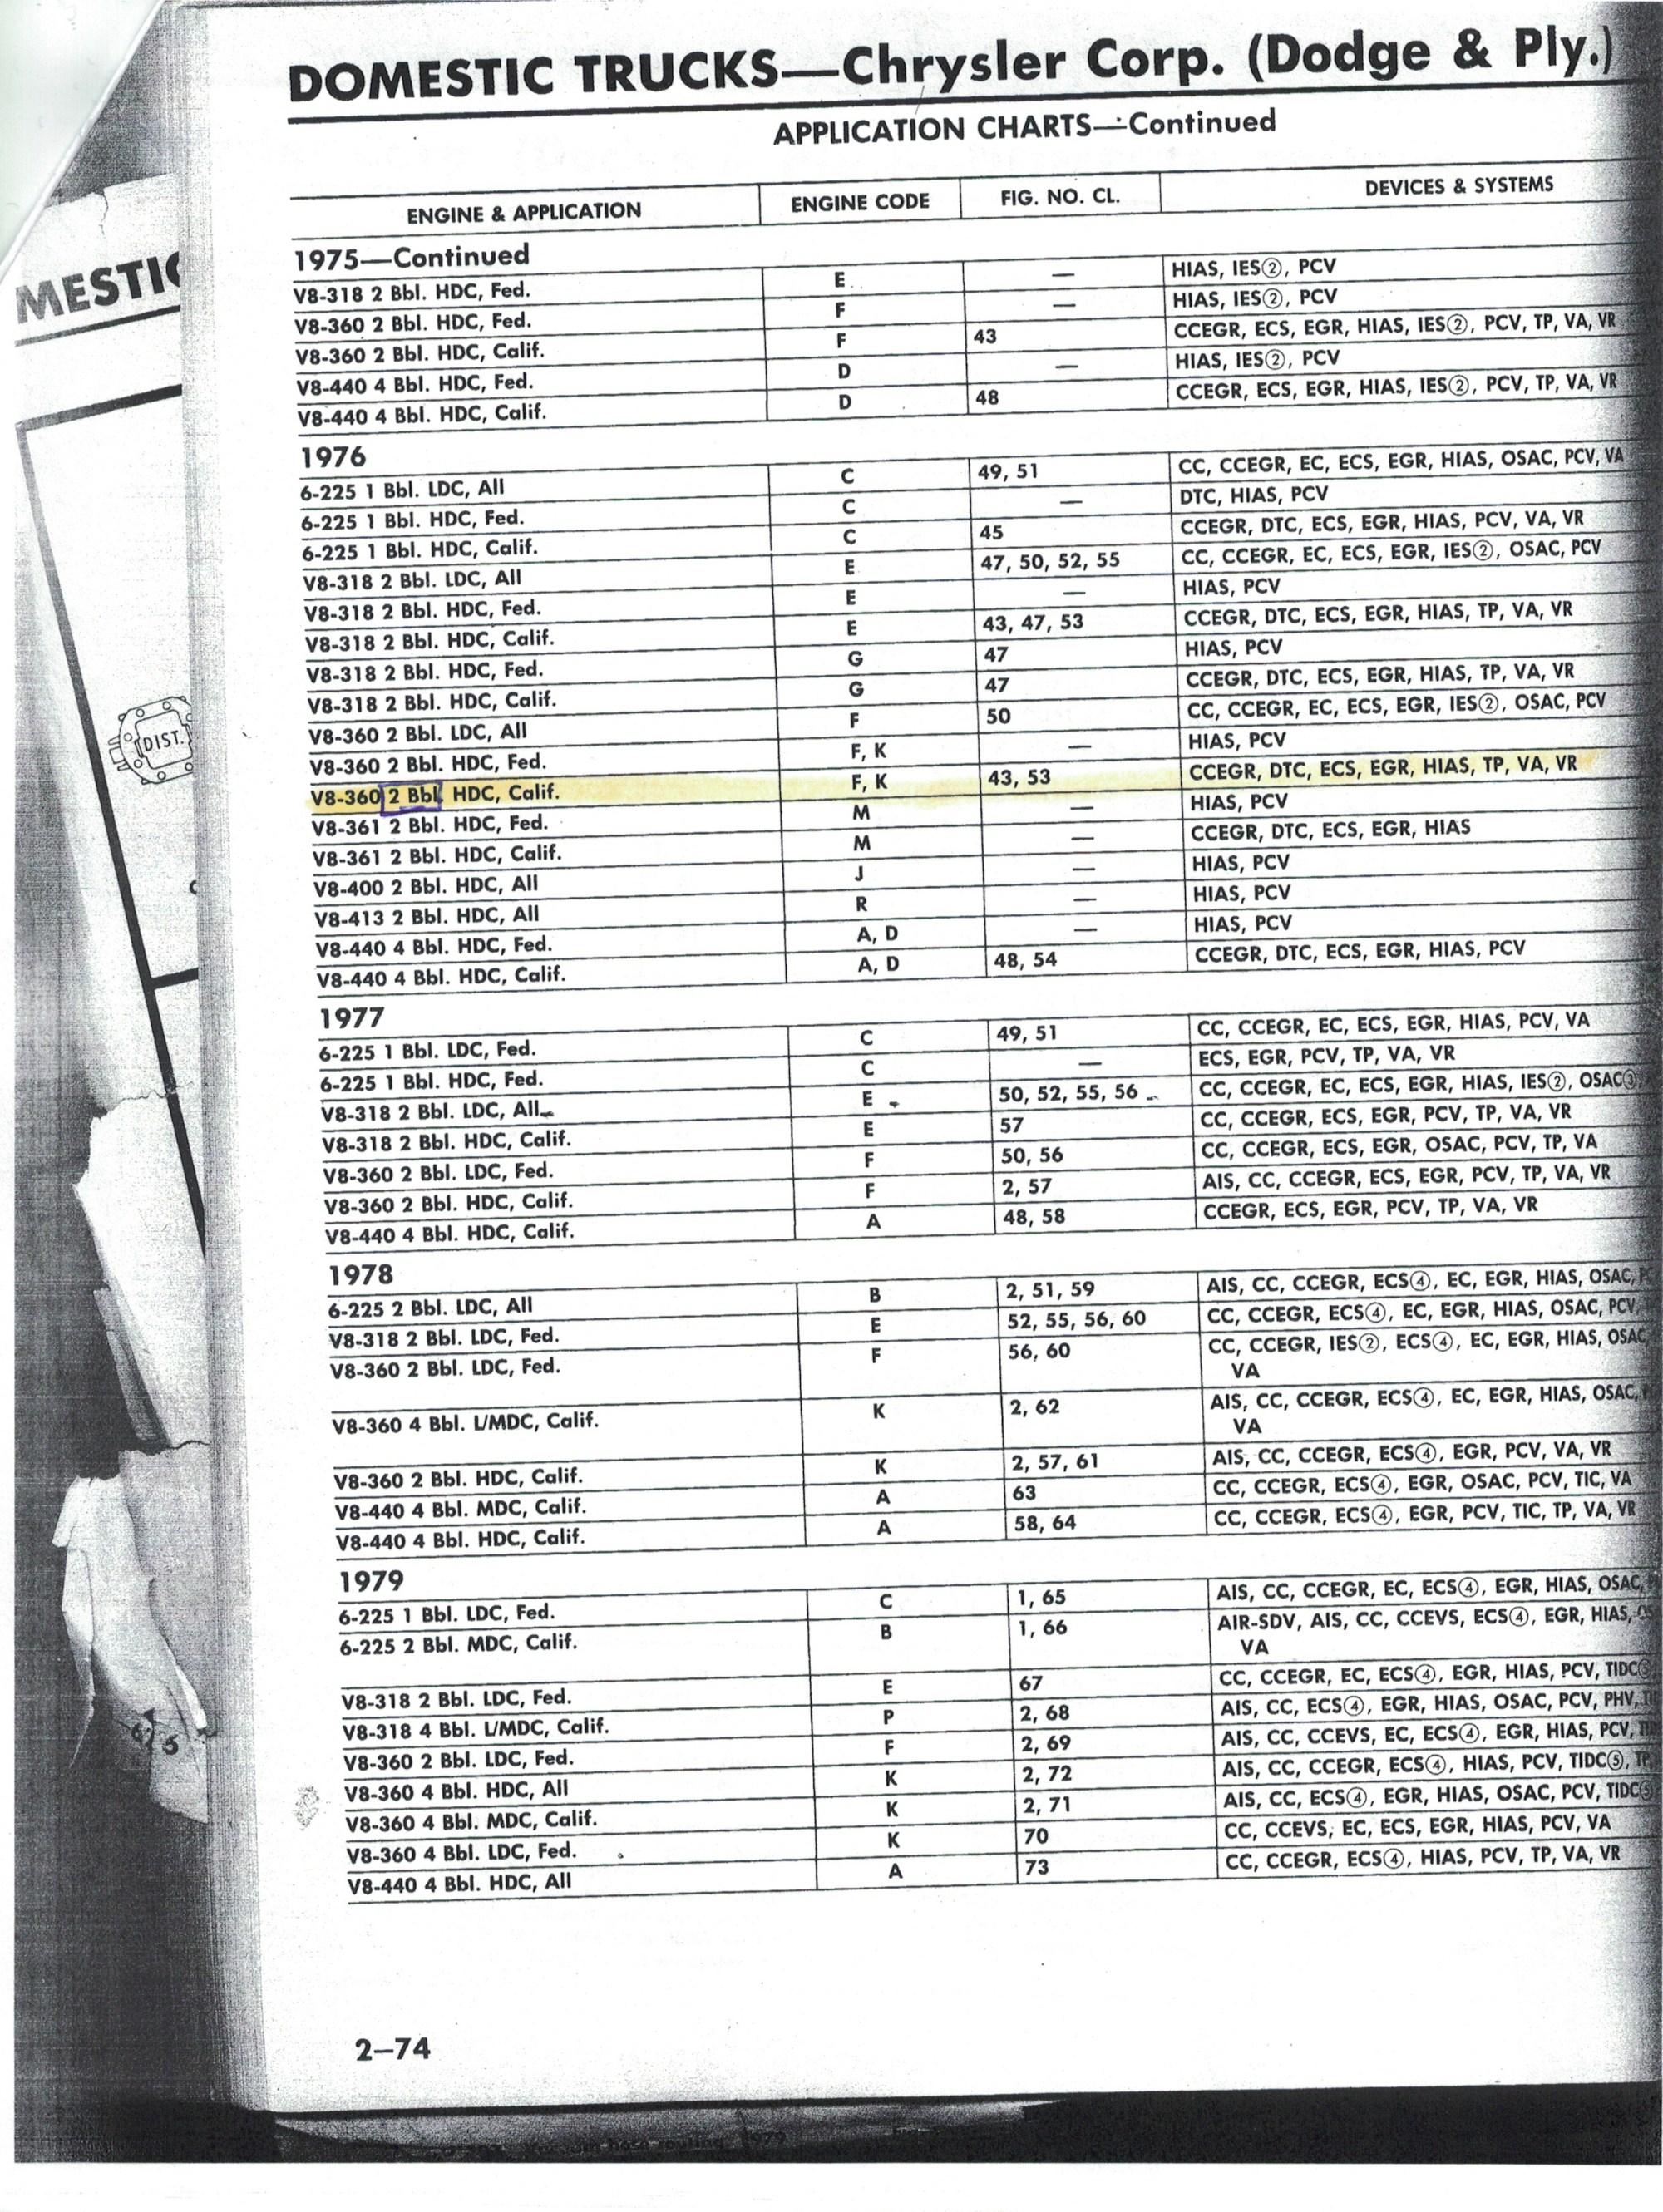 hight resolution of stock carburetor 1976 chrysler dodge 360 figure 111 chrysler vacuum system diagram for 1976 360cid v8